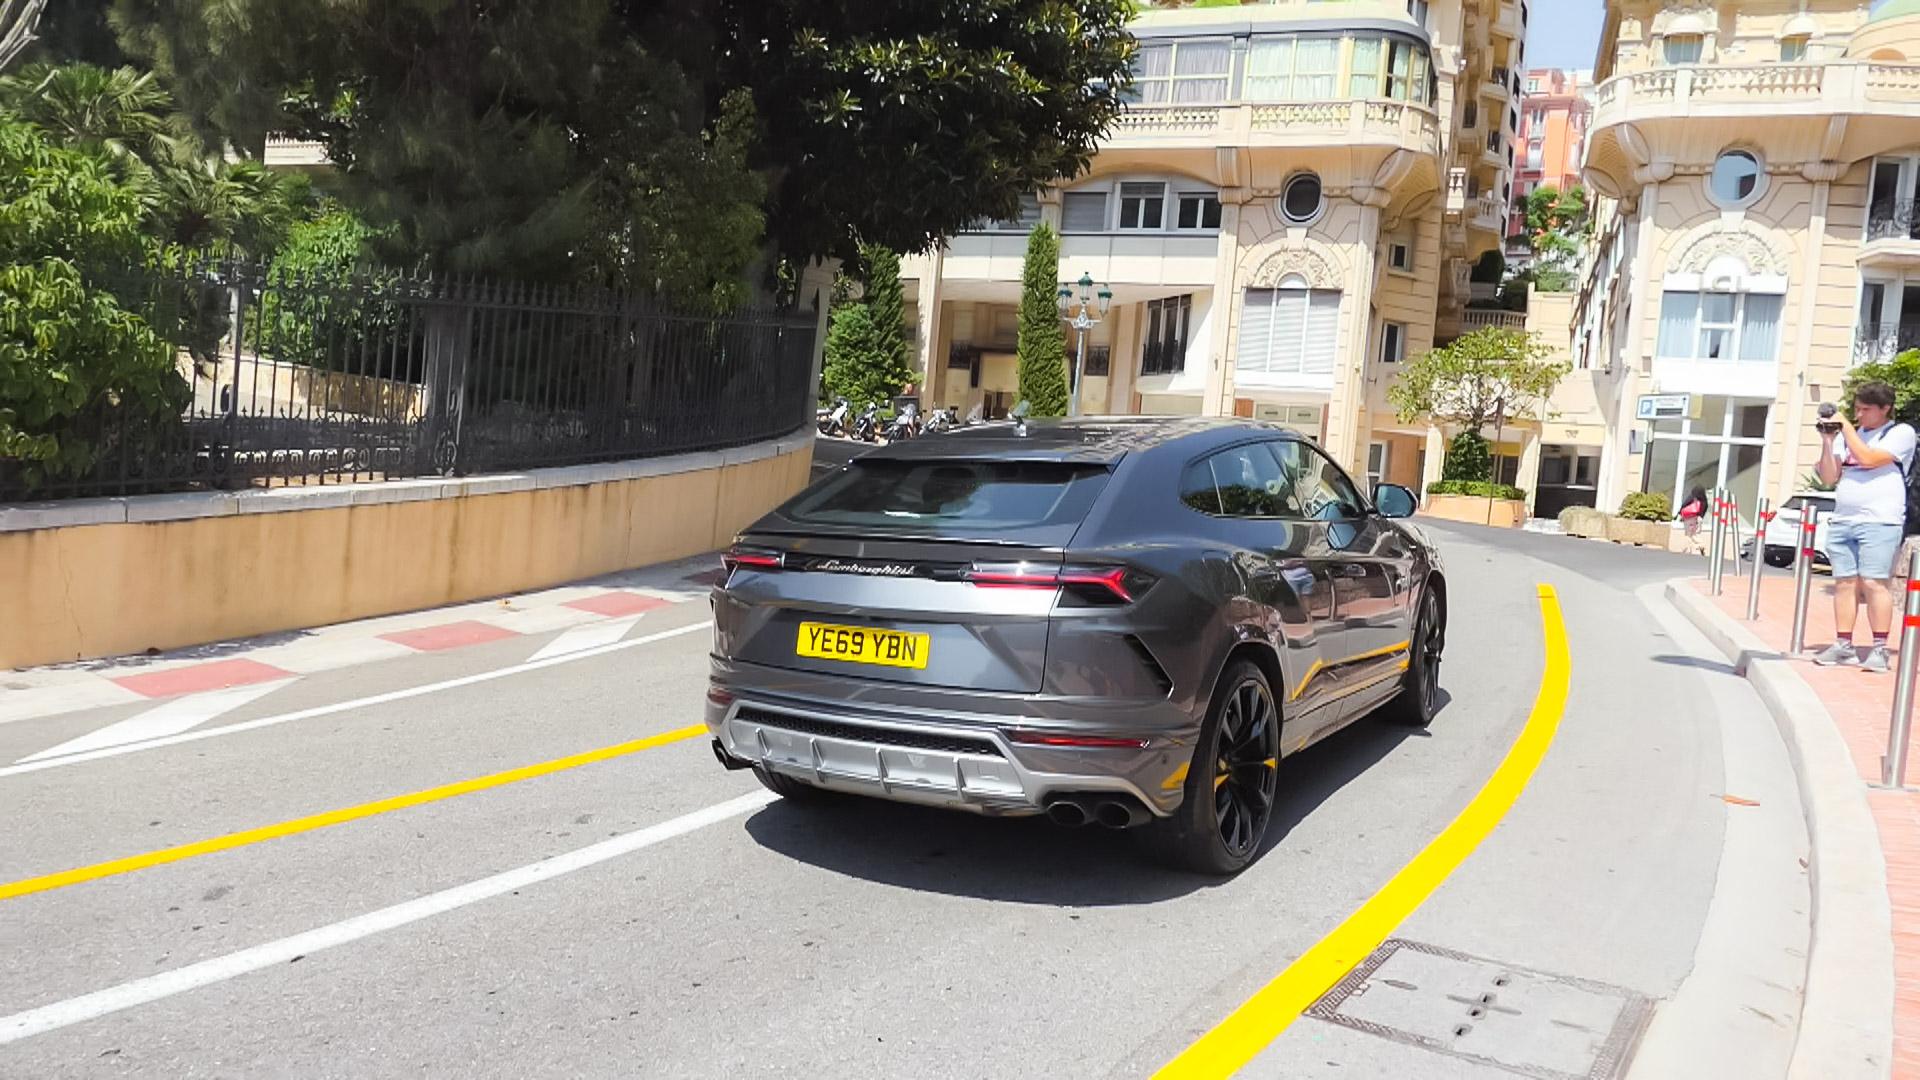 Lamborghini Urus - YE69-YBN (GB)